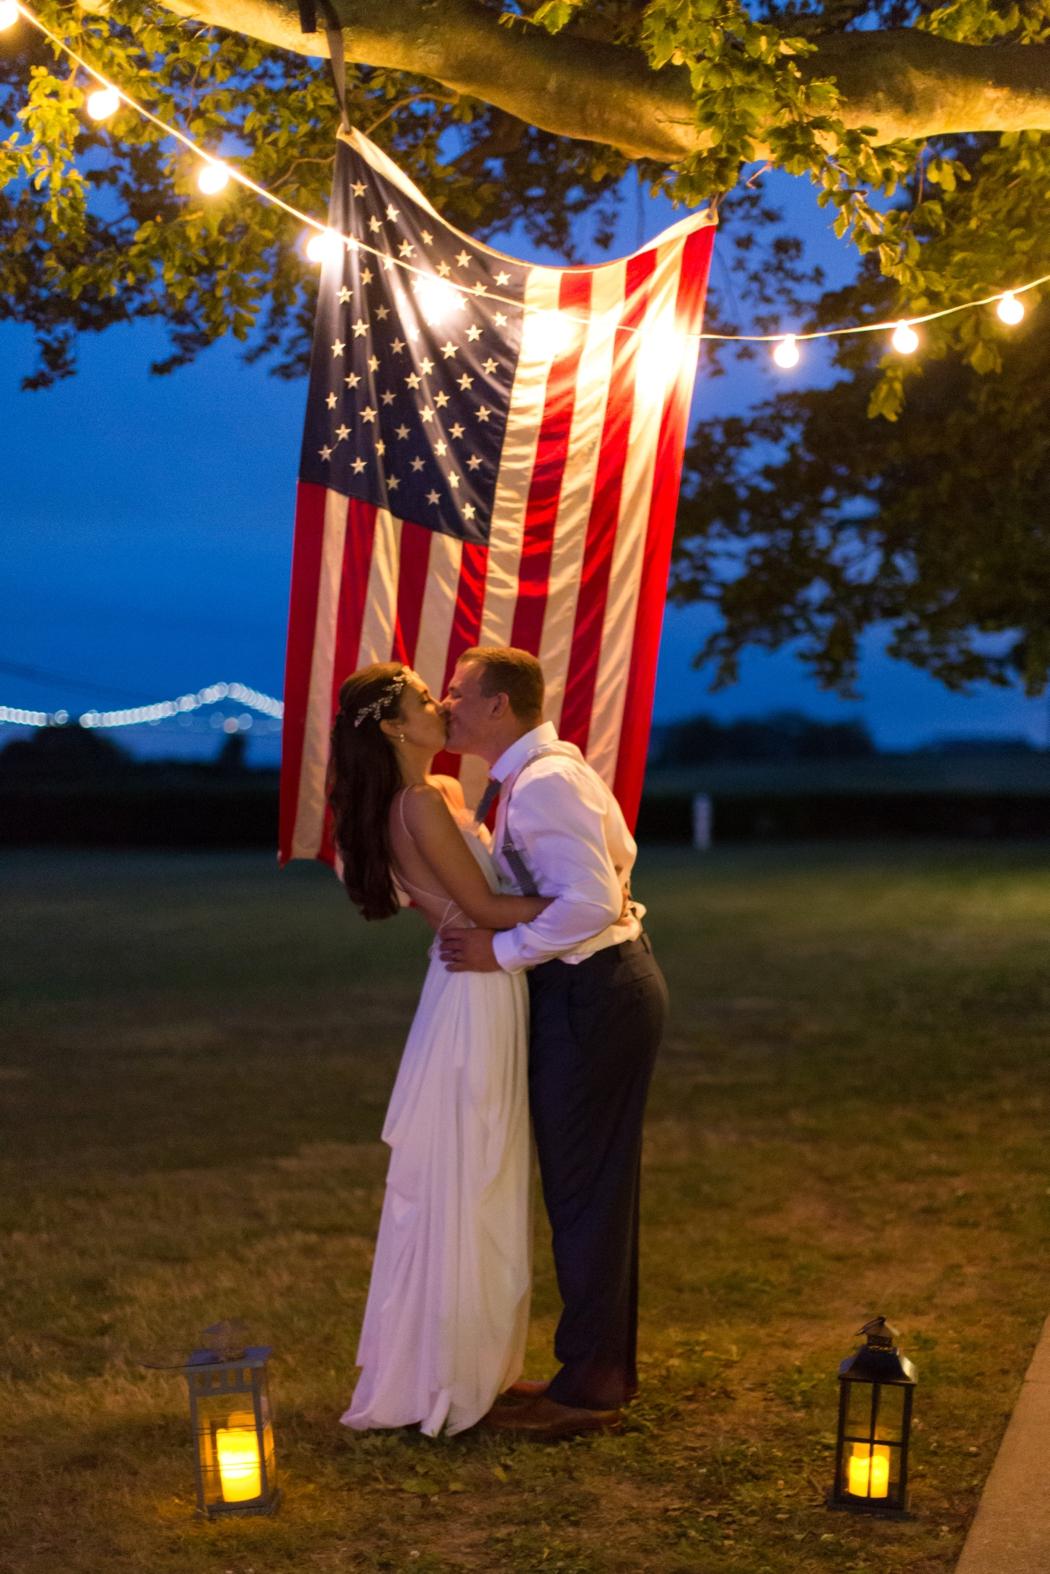 © Erin McGinn Photography | www.erinmcginn.com | newport ri wedding photographer